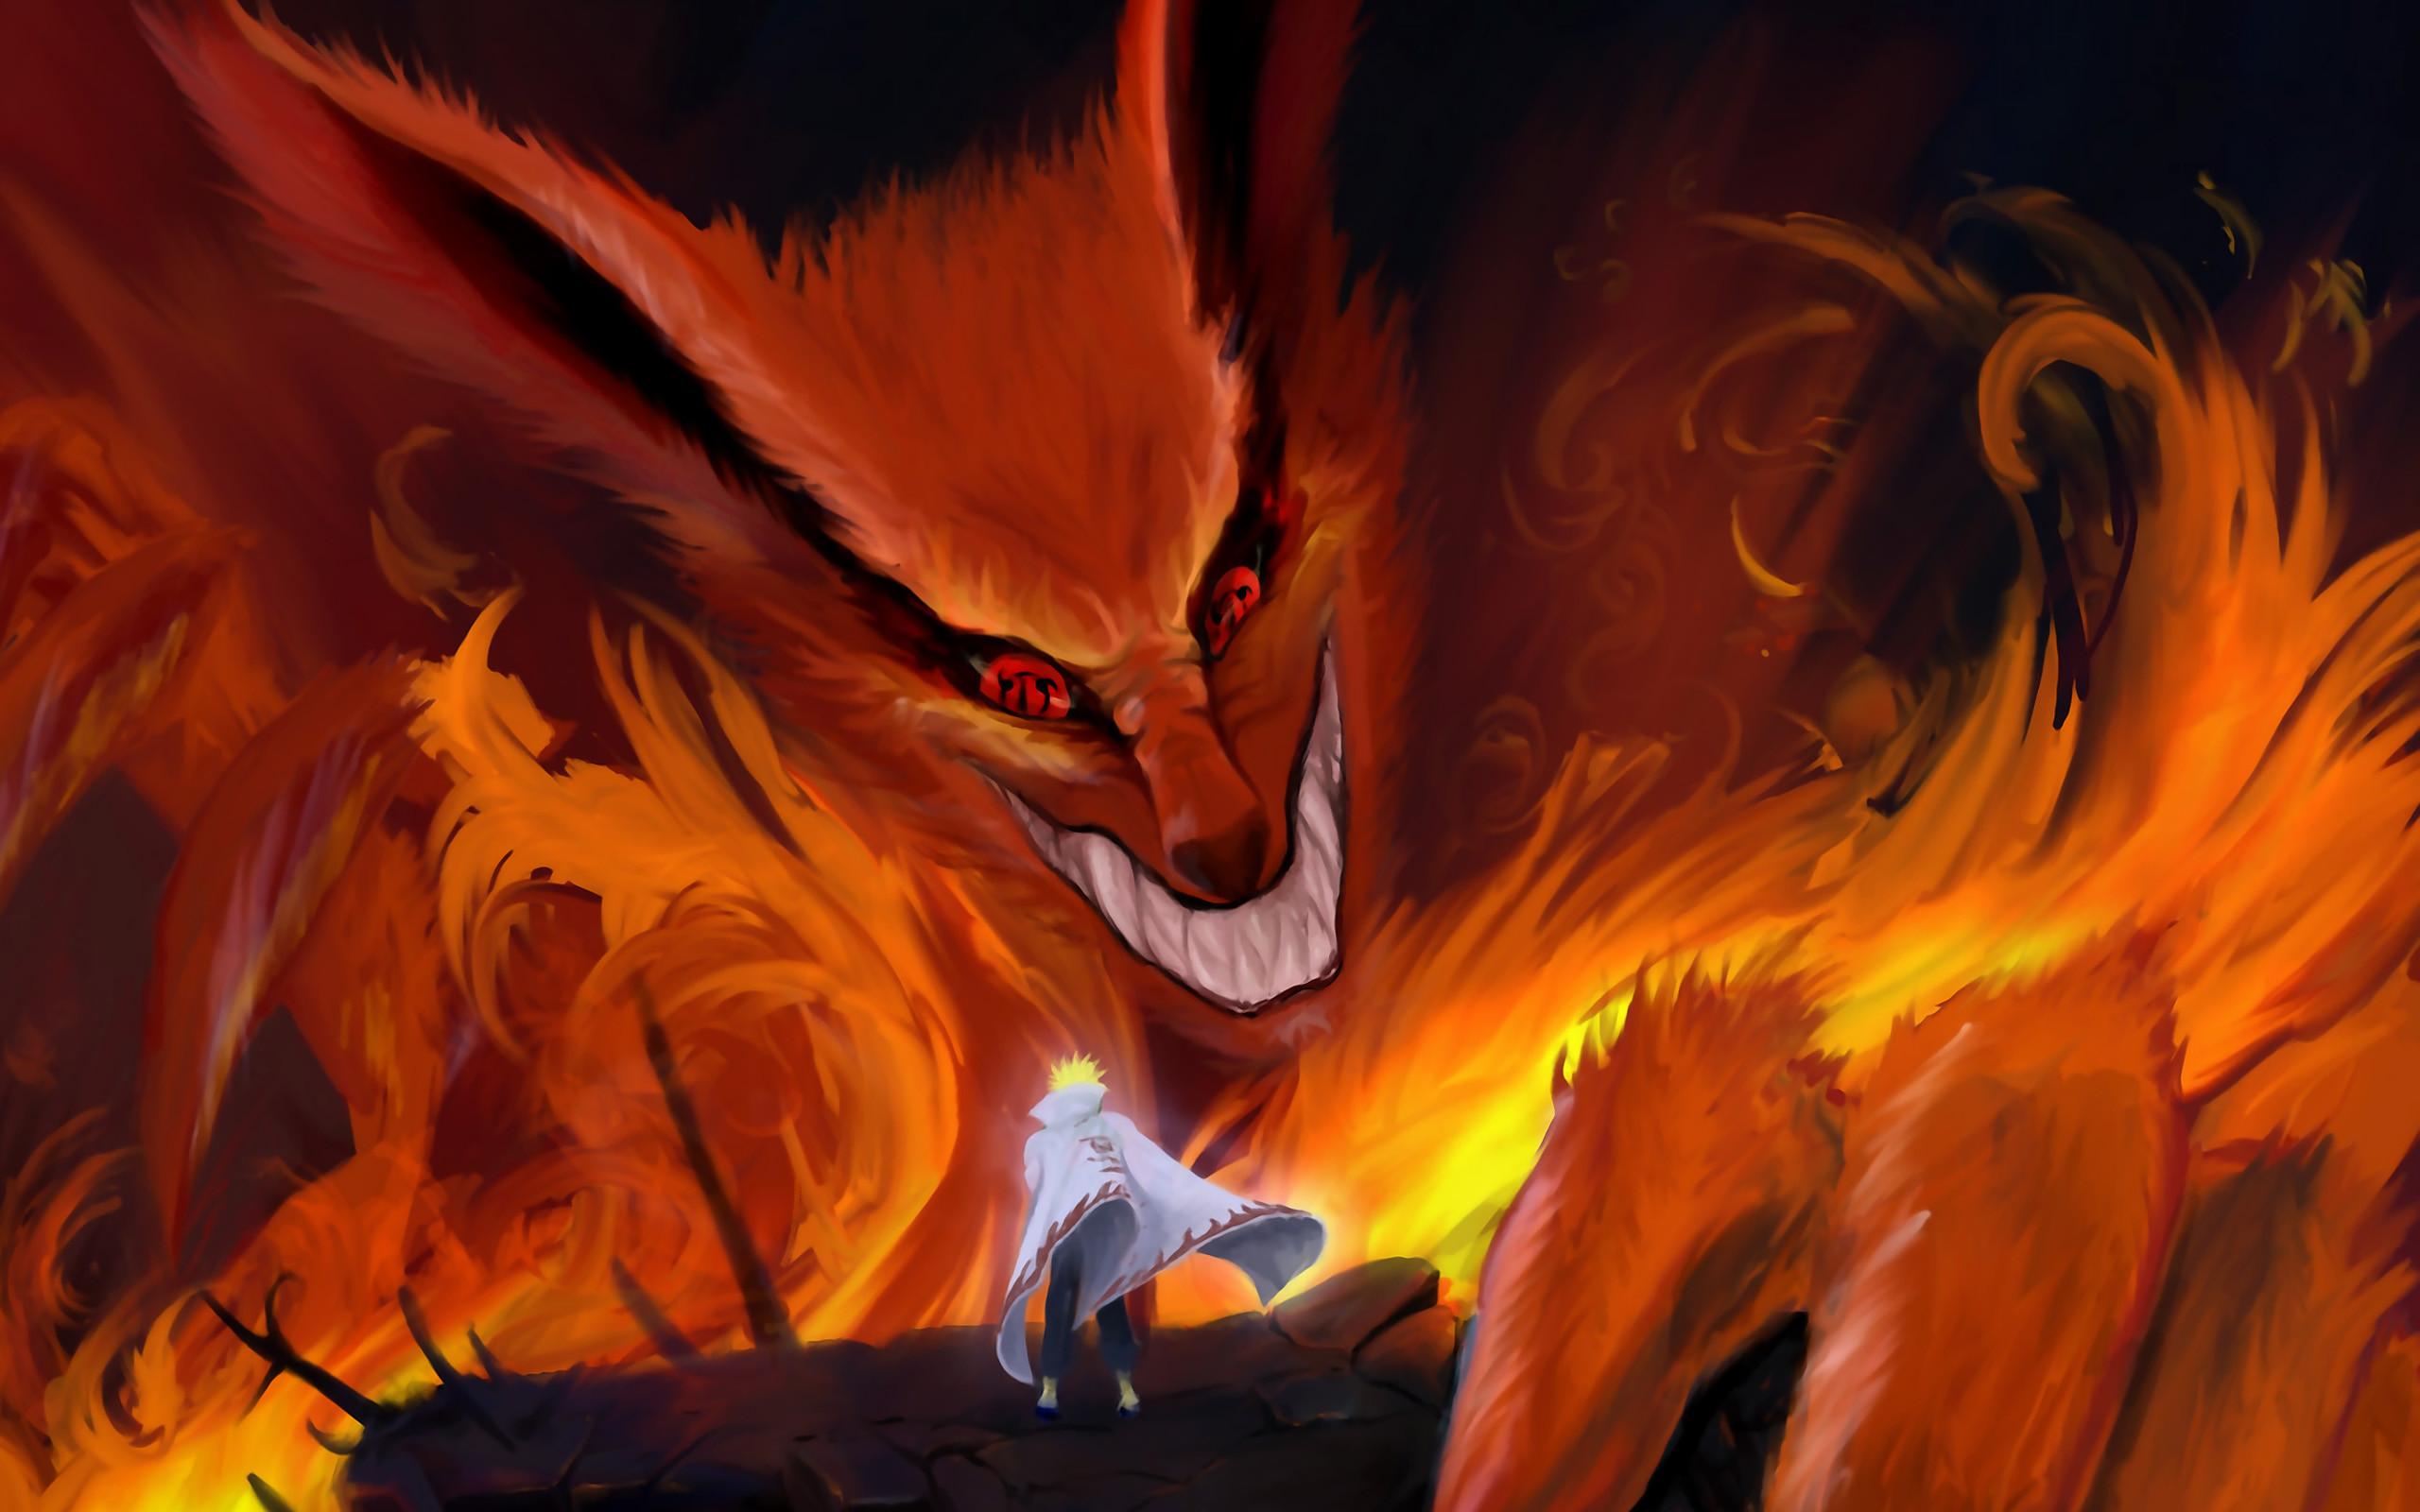 Great Wallpaper Naruto Fox - 594901-popular-naruto-nine-tailed-fox-wallpaper-2560x1600-for-pc  Image_182221.jpg